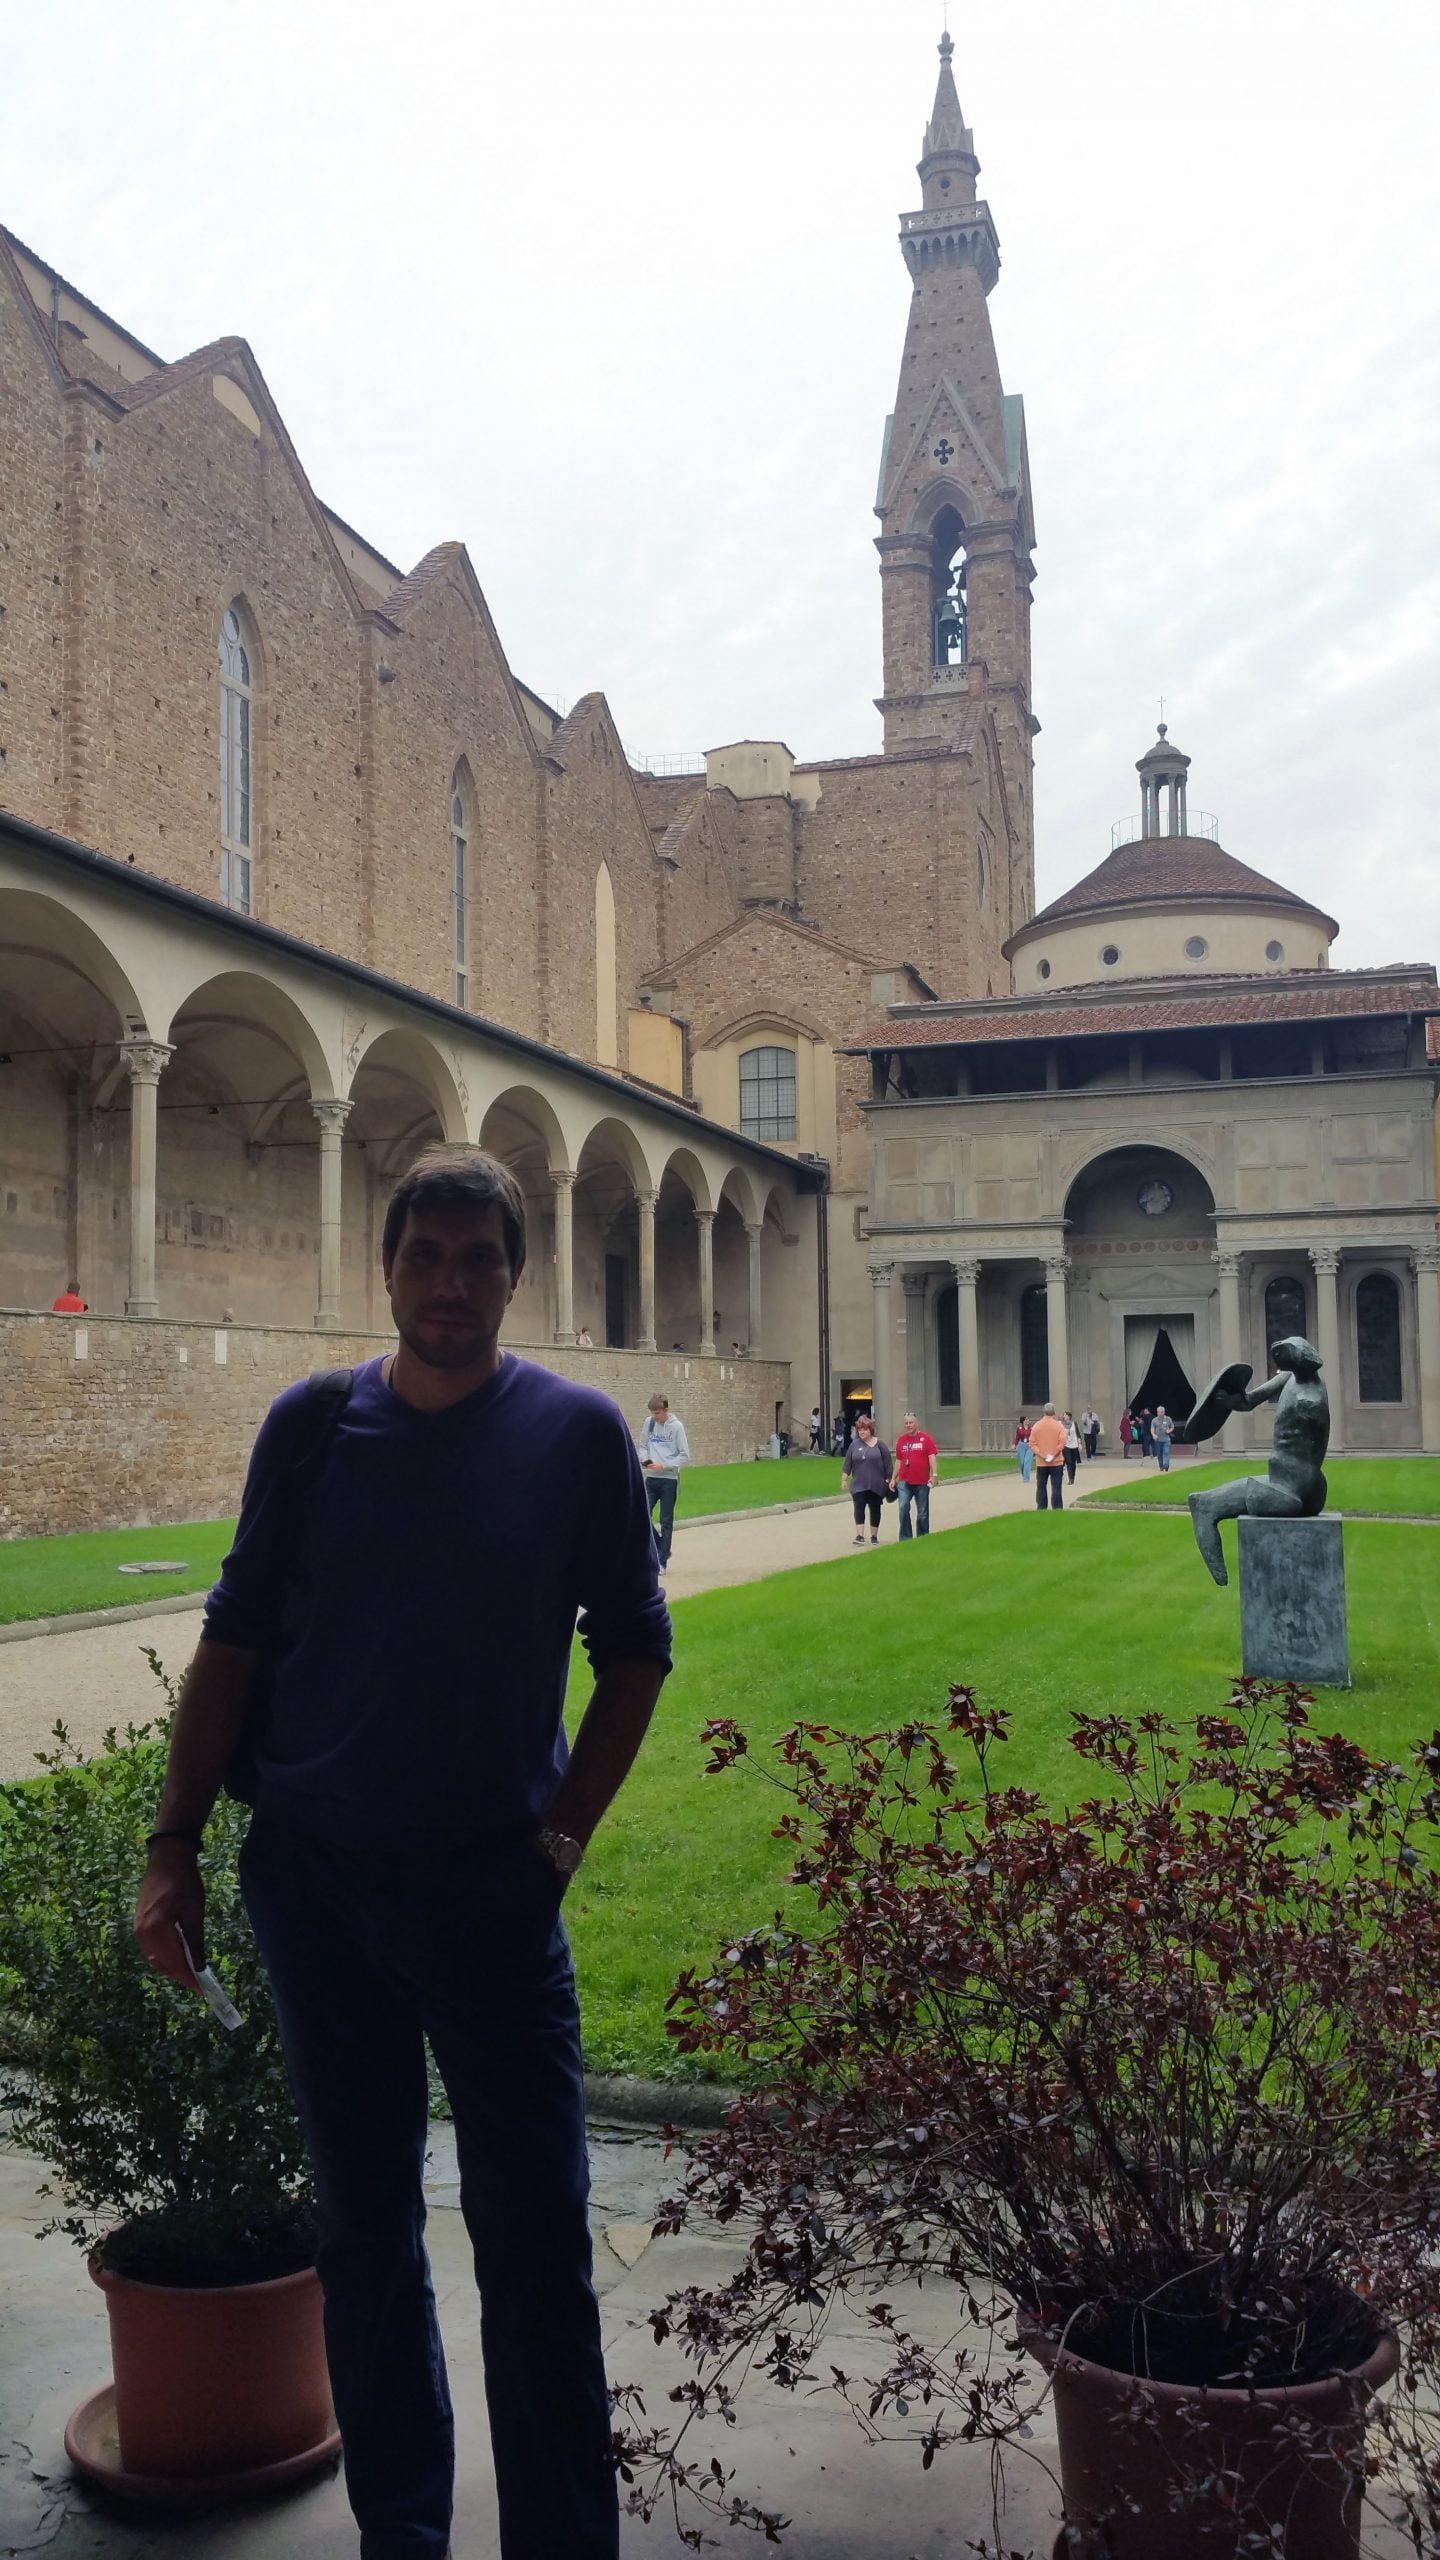 5_Italija_Firenca_Crkva_svetog_krsta_evropski_gradovi_aviono